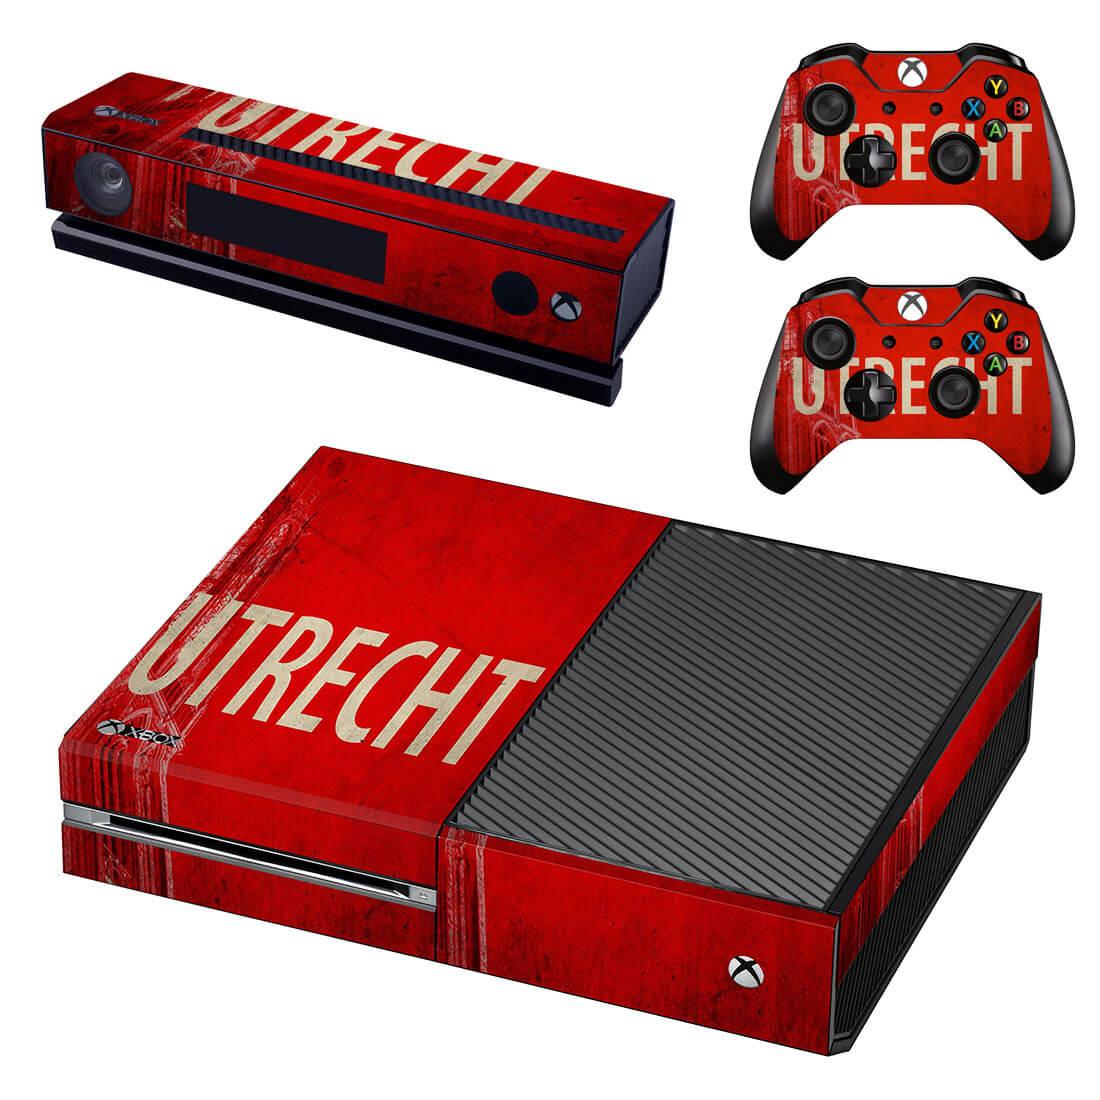 Utrecht Xbox One skin